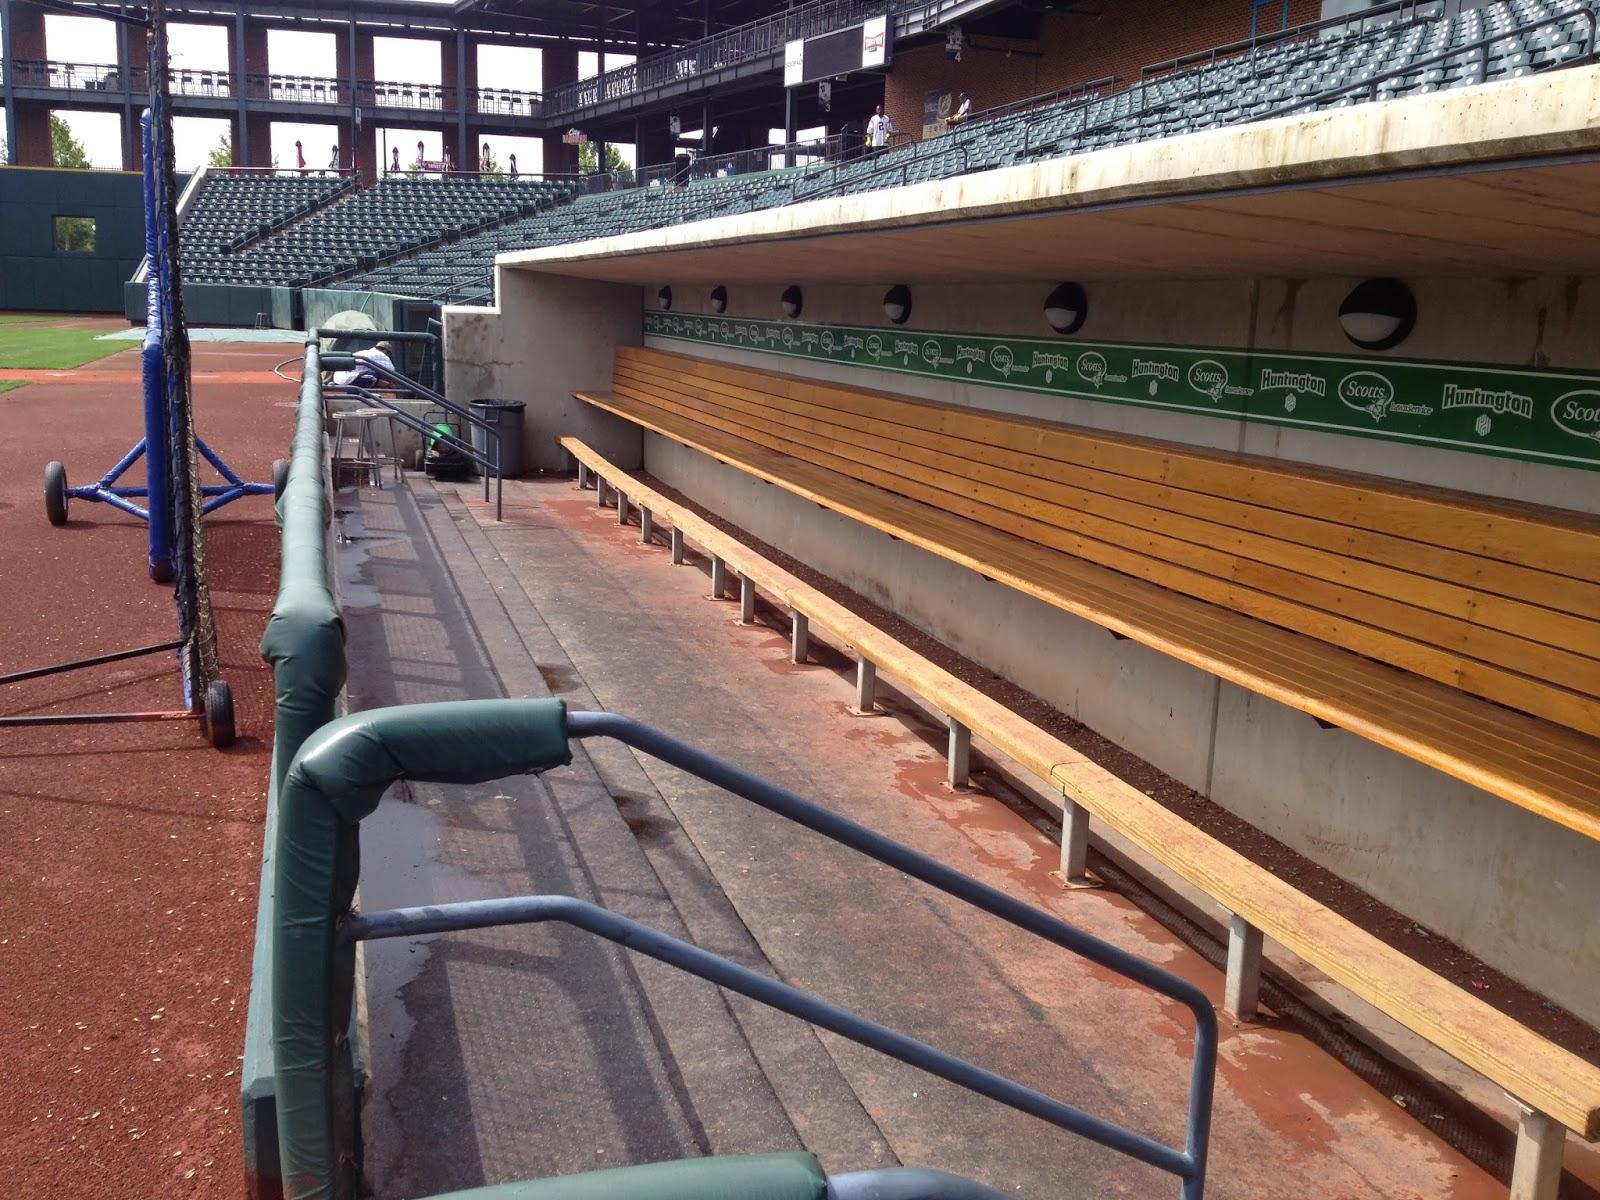 Smart Turf Baseball And Softball Dugout Designs And Extra